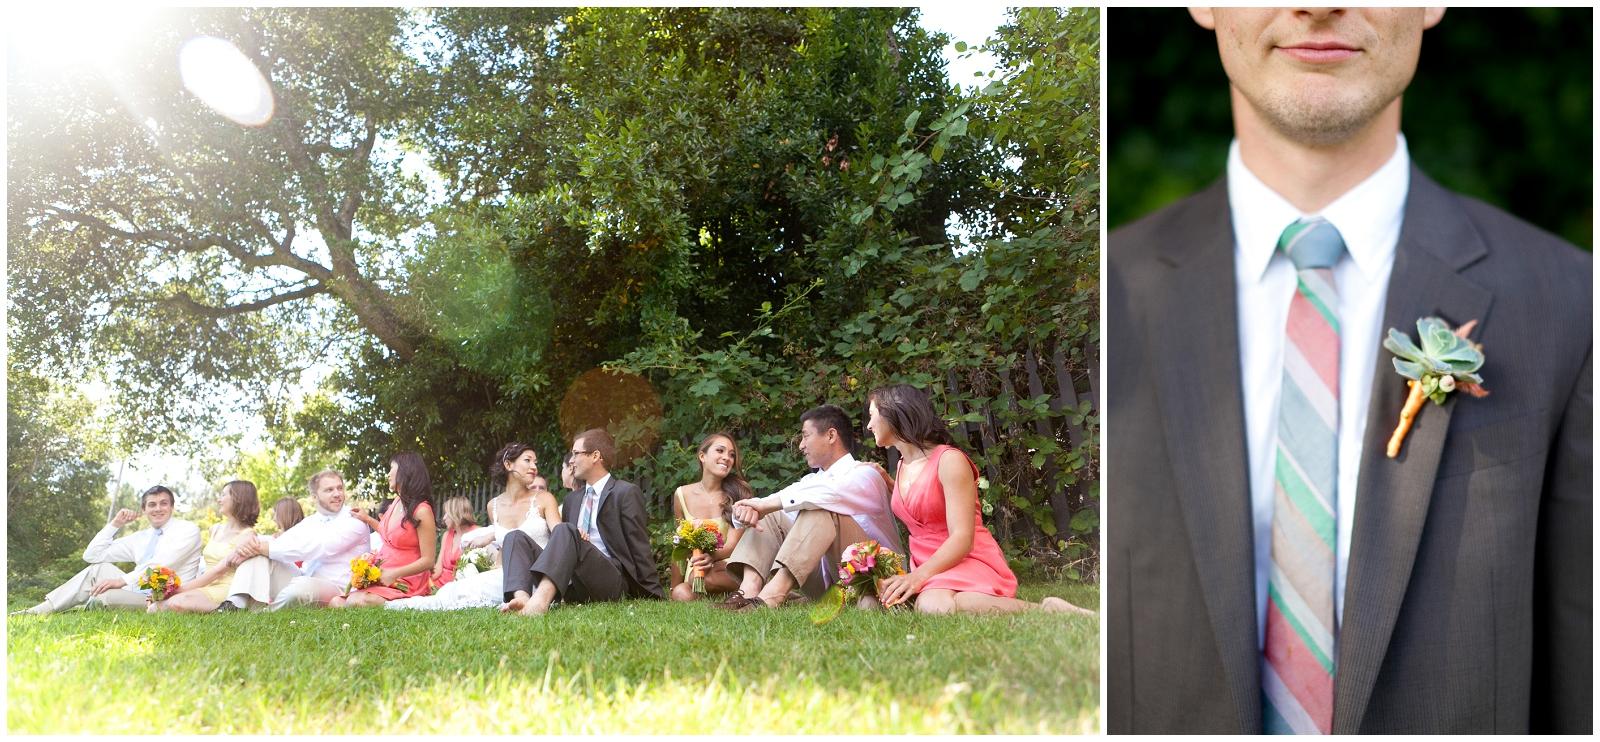 San-Francisco-Bay-Area-Wedding-Photography-Brazilian-Room-10.jpg